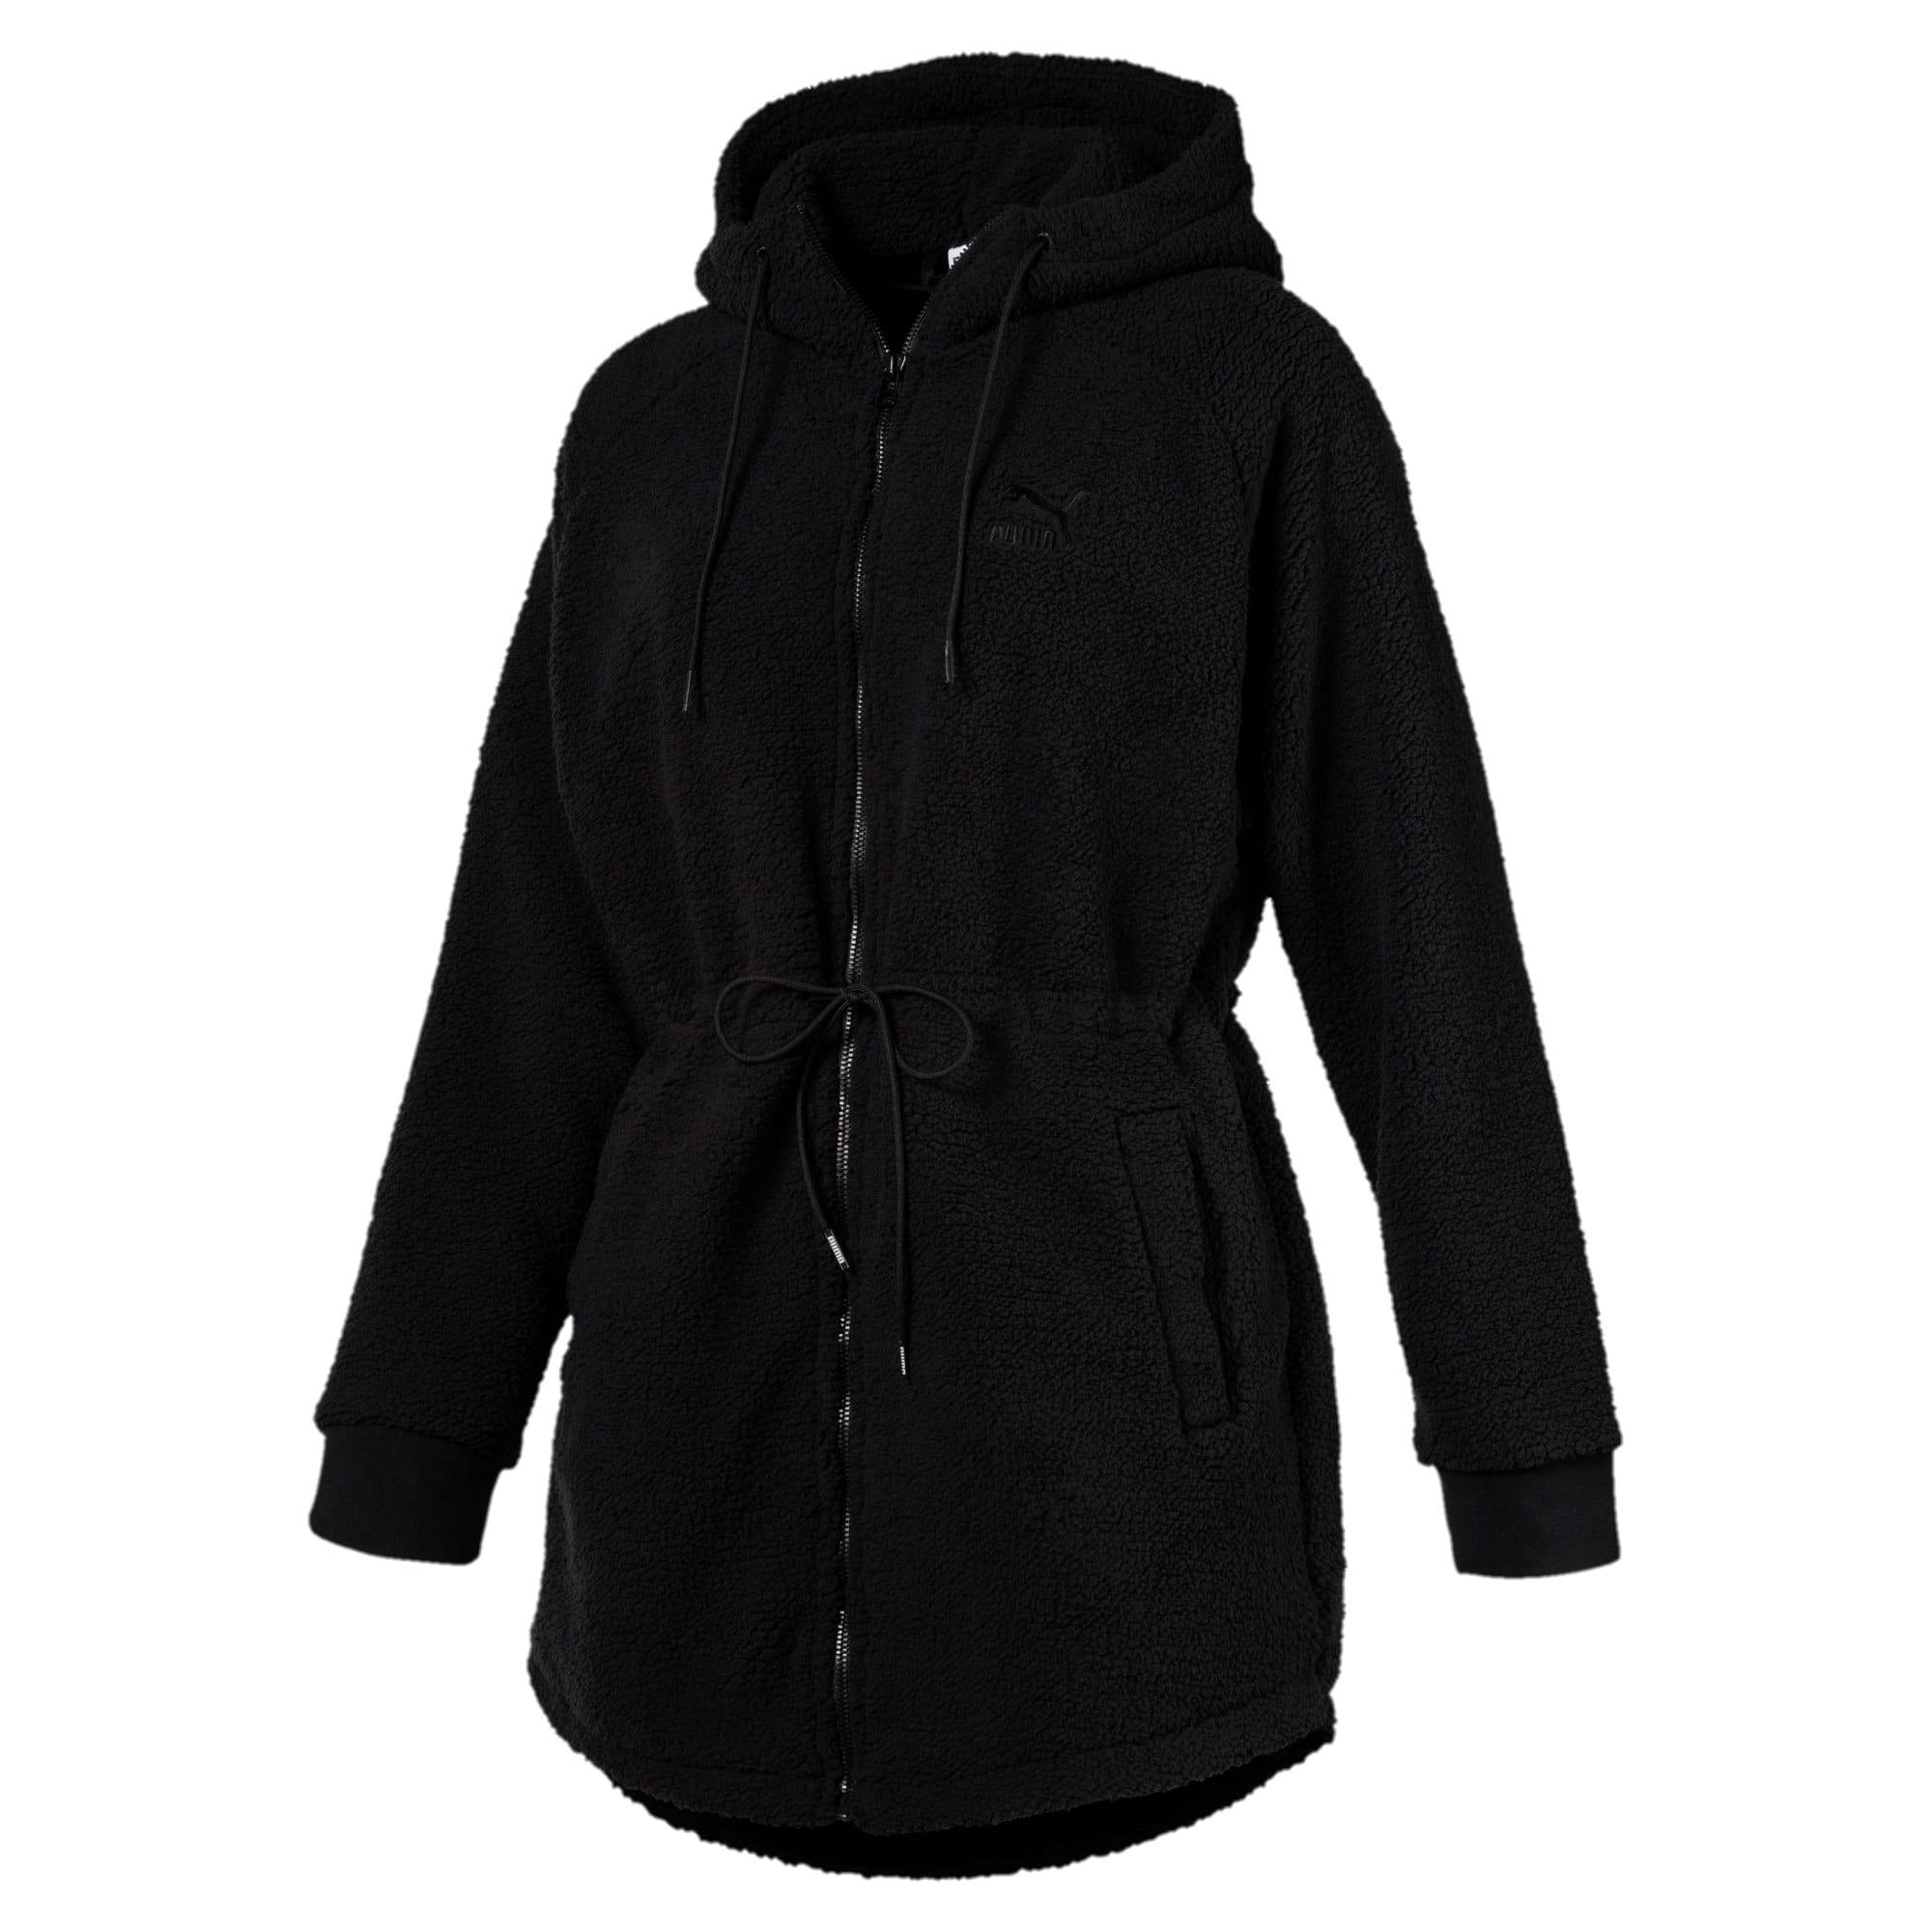 Thumbnail 1 of Downtown Winterised Full Zip Women's Sherpa Hoodie, Puma Black, medium